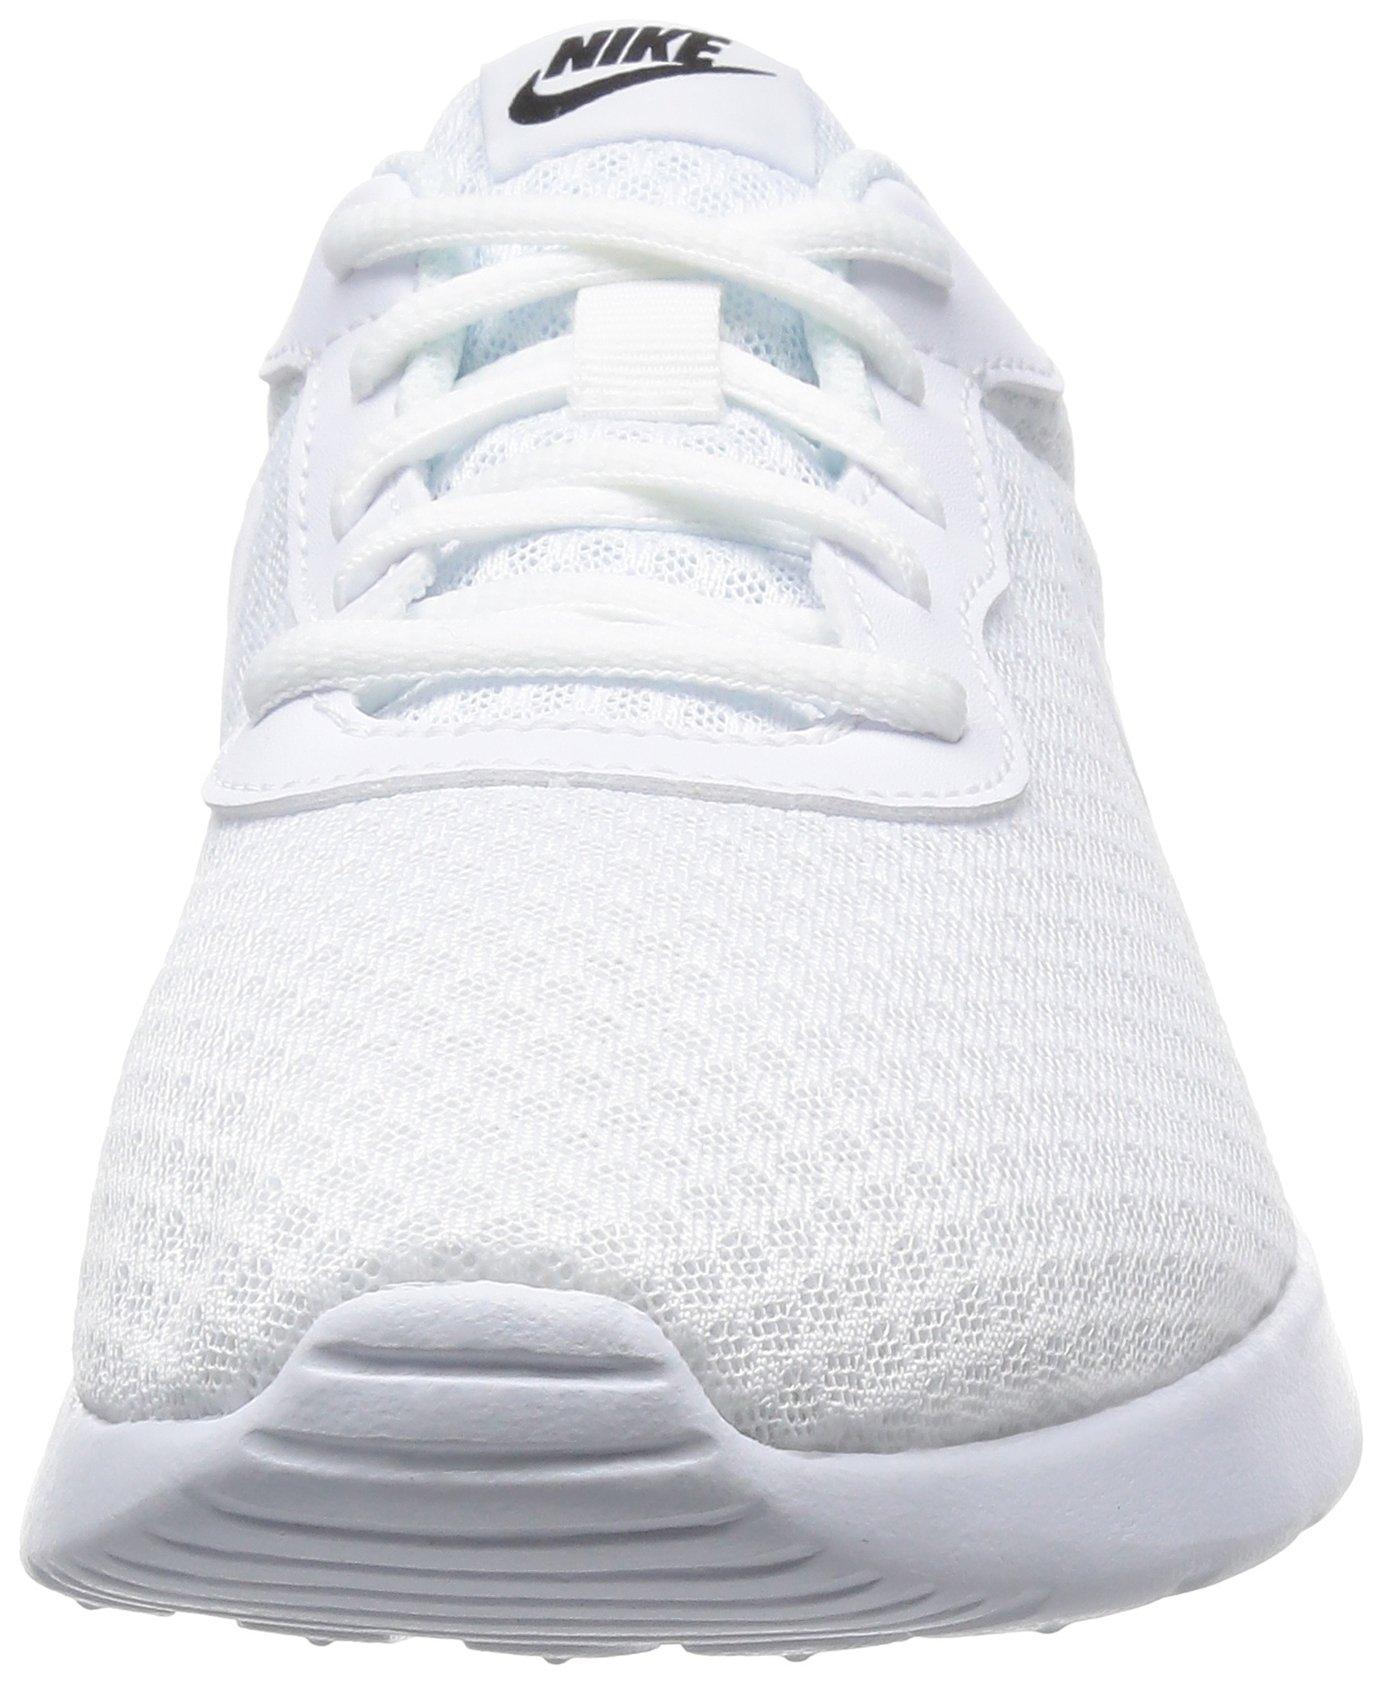 NIKE Mens Tanjun Running Shoes WhiteBlack 812654 110 Size